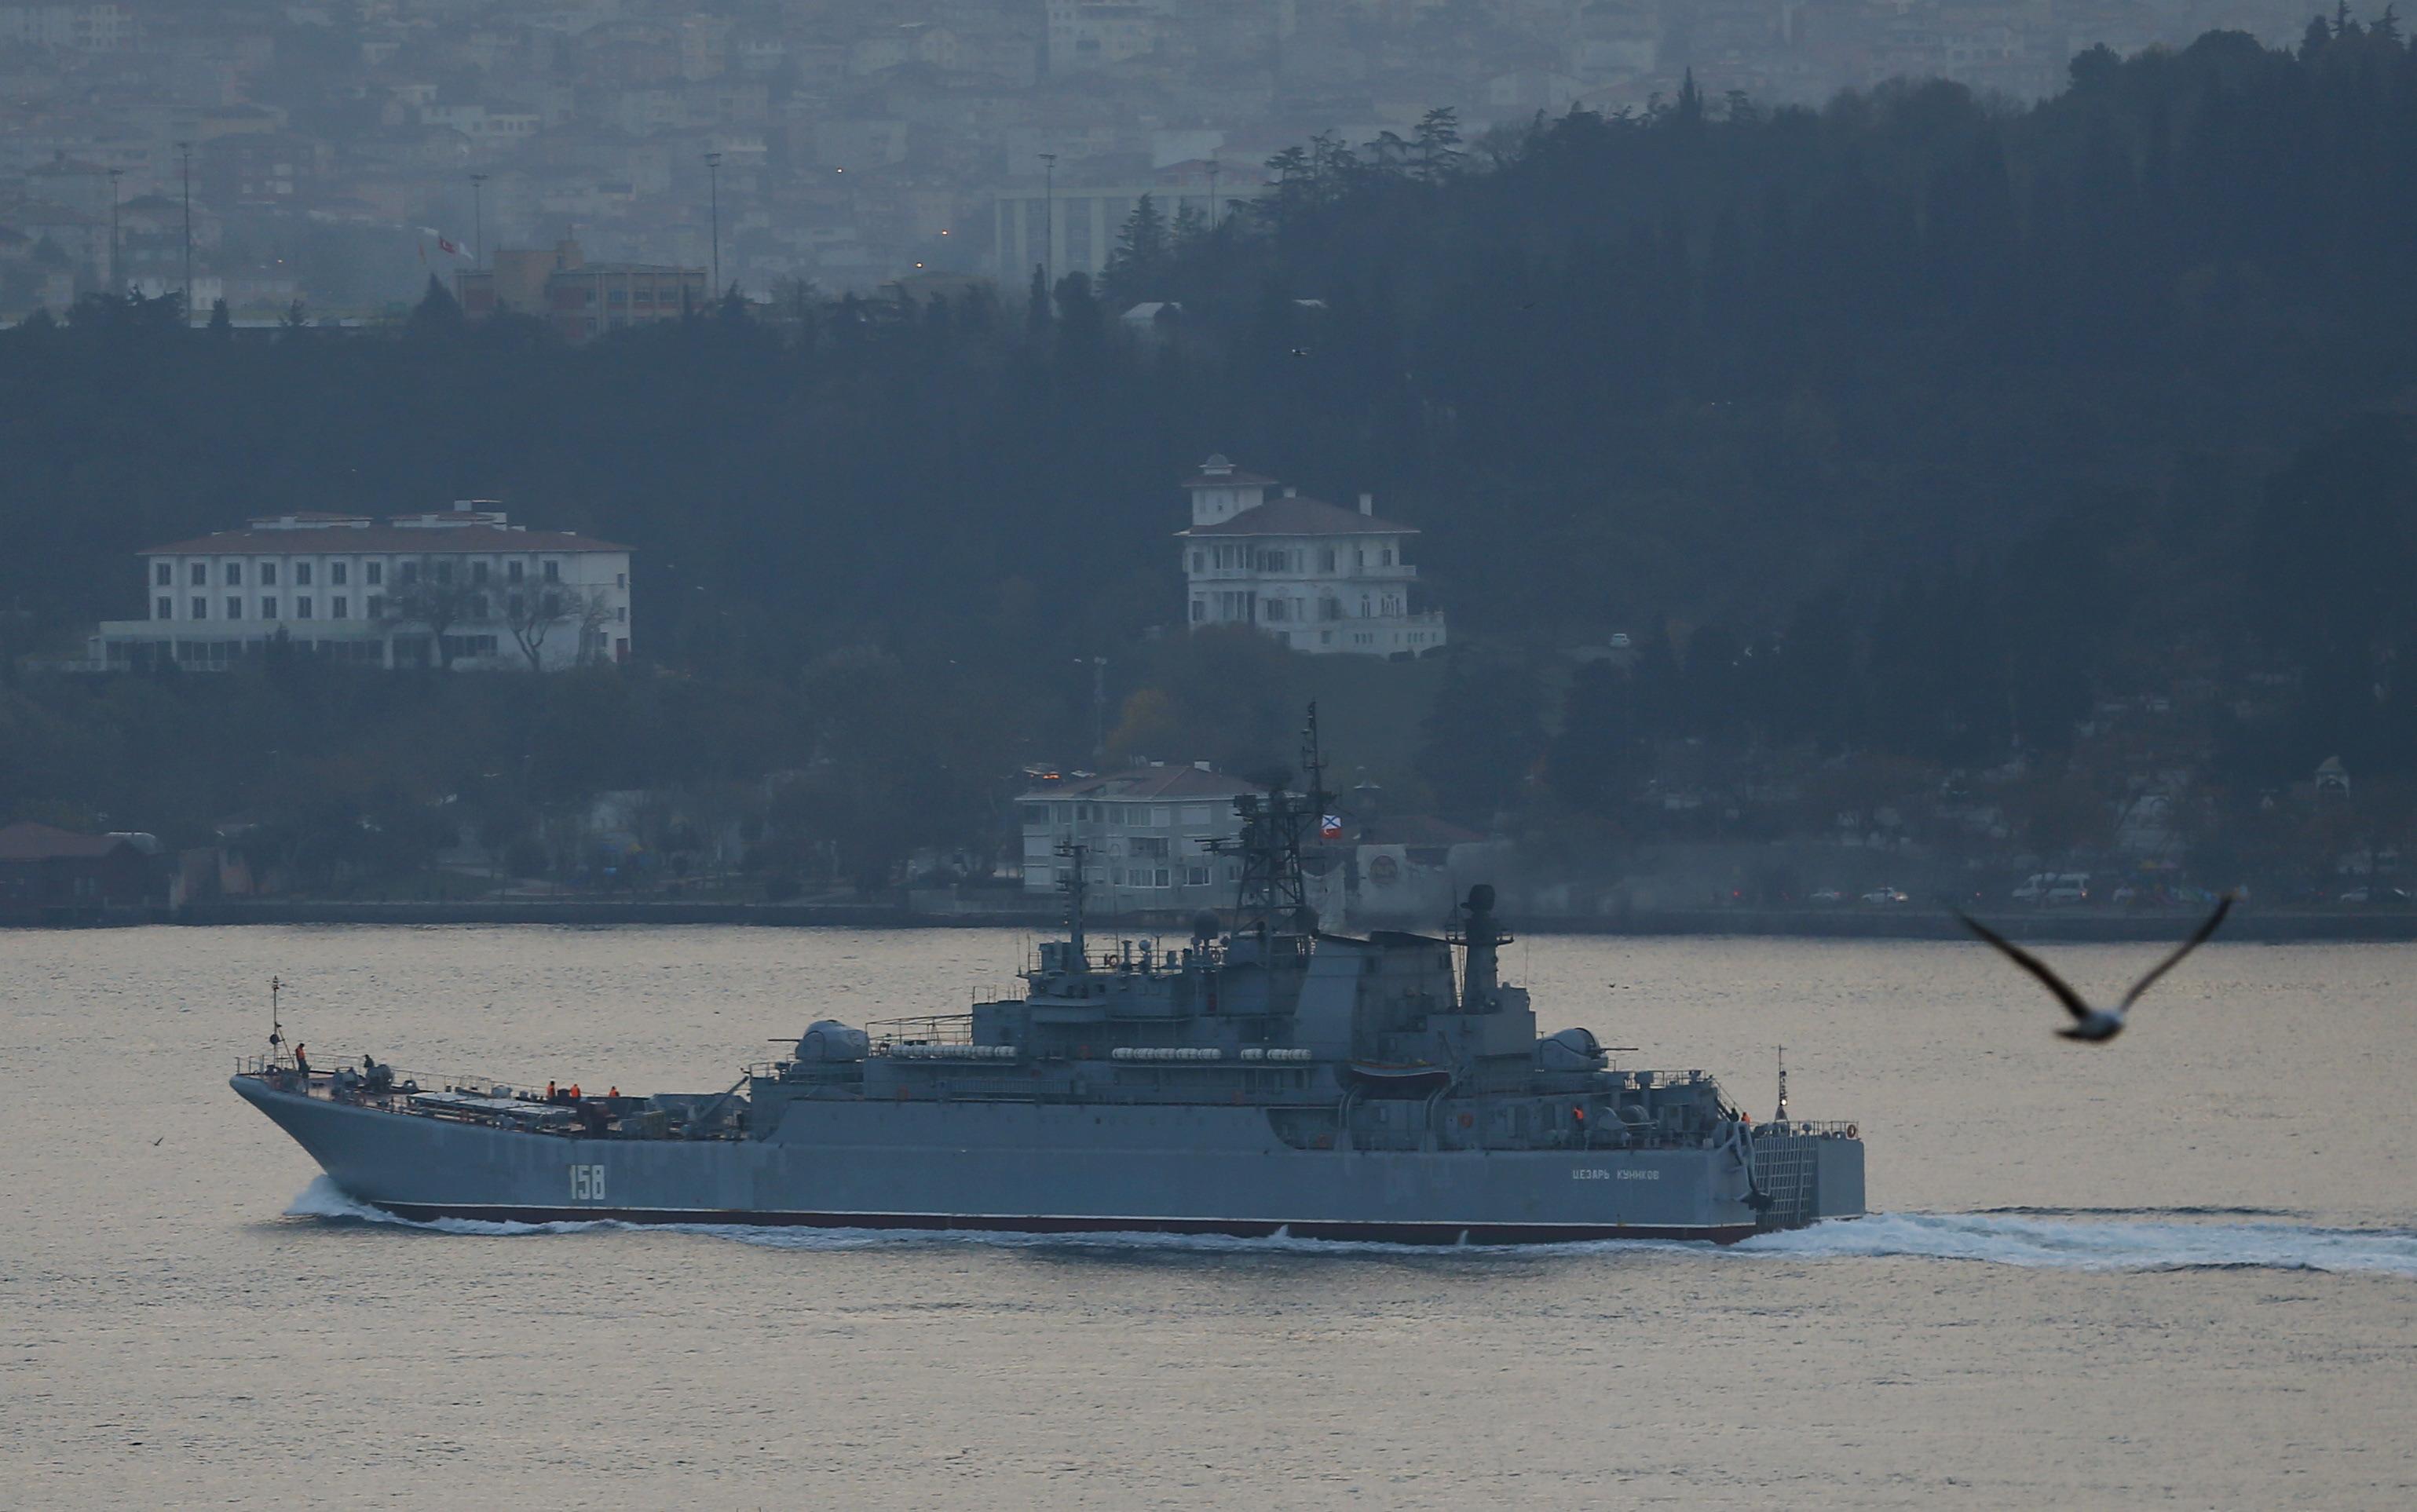 The Russian navy's large landing ship Caesar Kunikov sets sail in the Bosporus toward the Black Sea, in Istanbul on Nov. 25, 2015